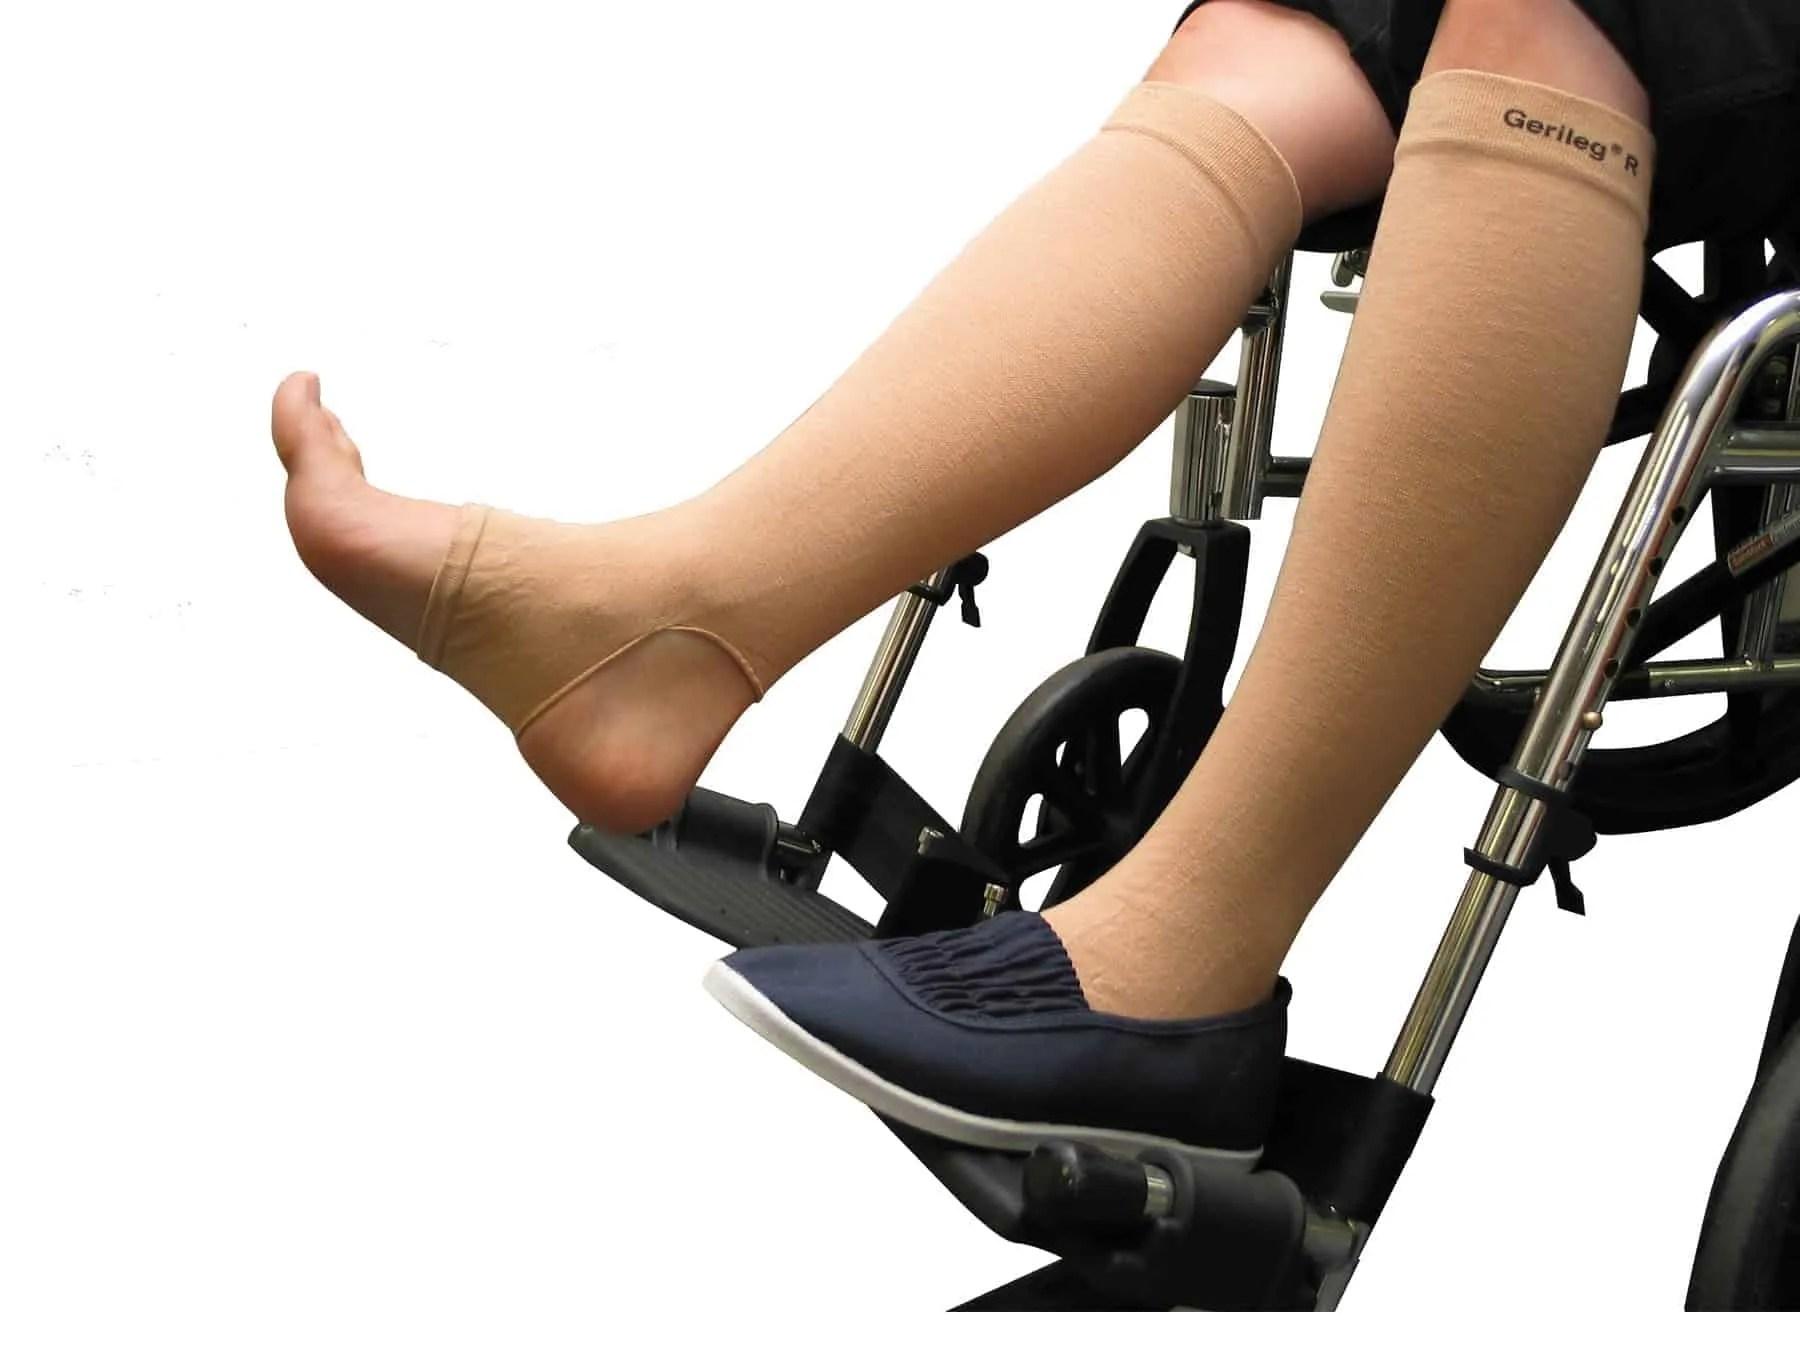 Geri Leg Protection Product